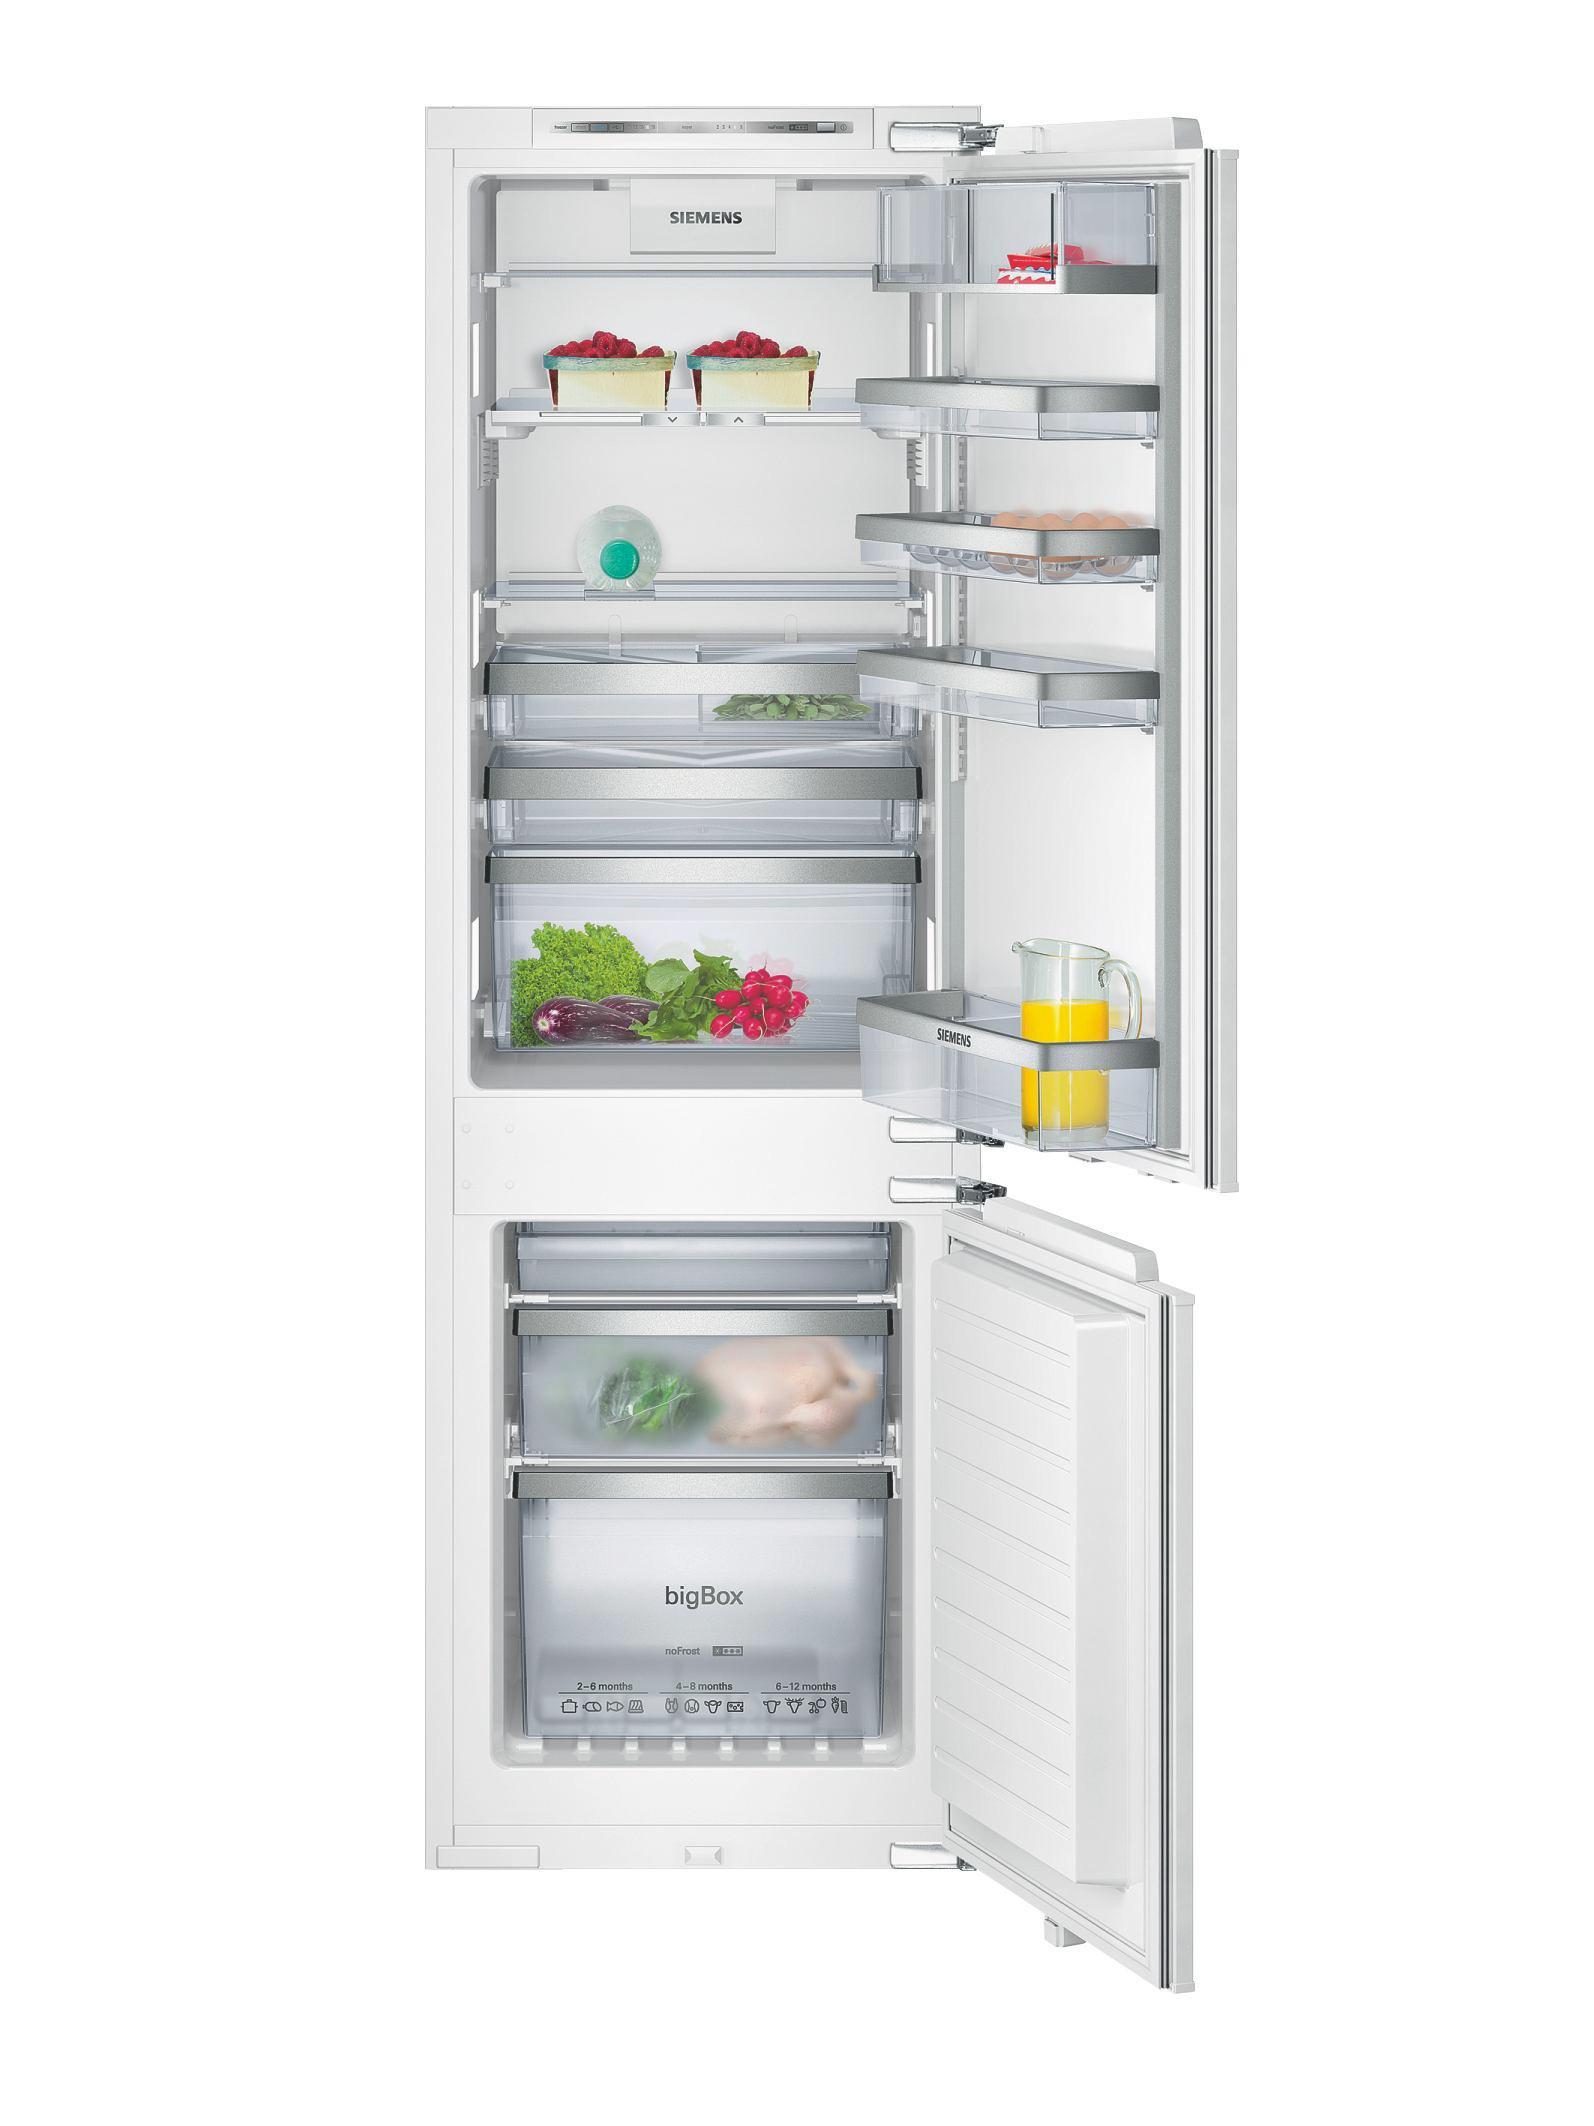 Kühl-Gefrier-Kombination Siemens Ki34np60, EEZ A++ - Weiß, MODERN (55,6/177,2/54,5cm) - SIEMENS